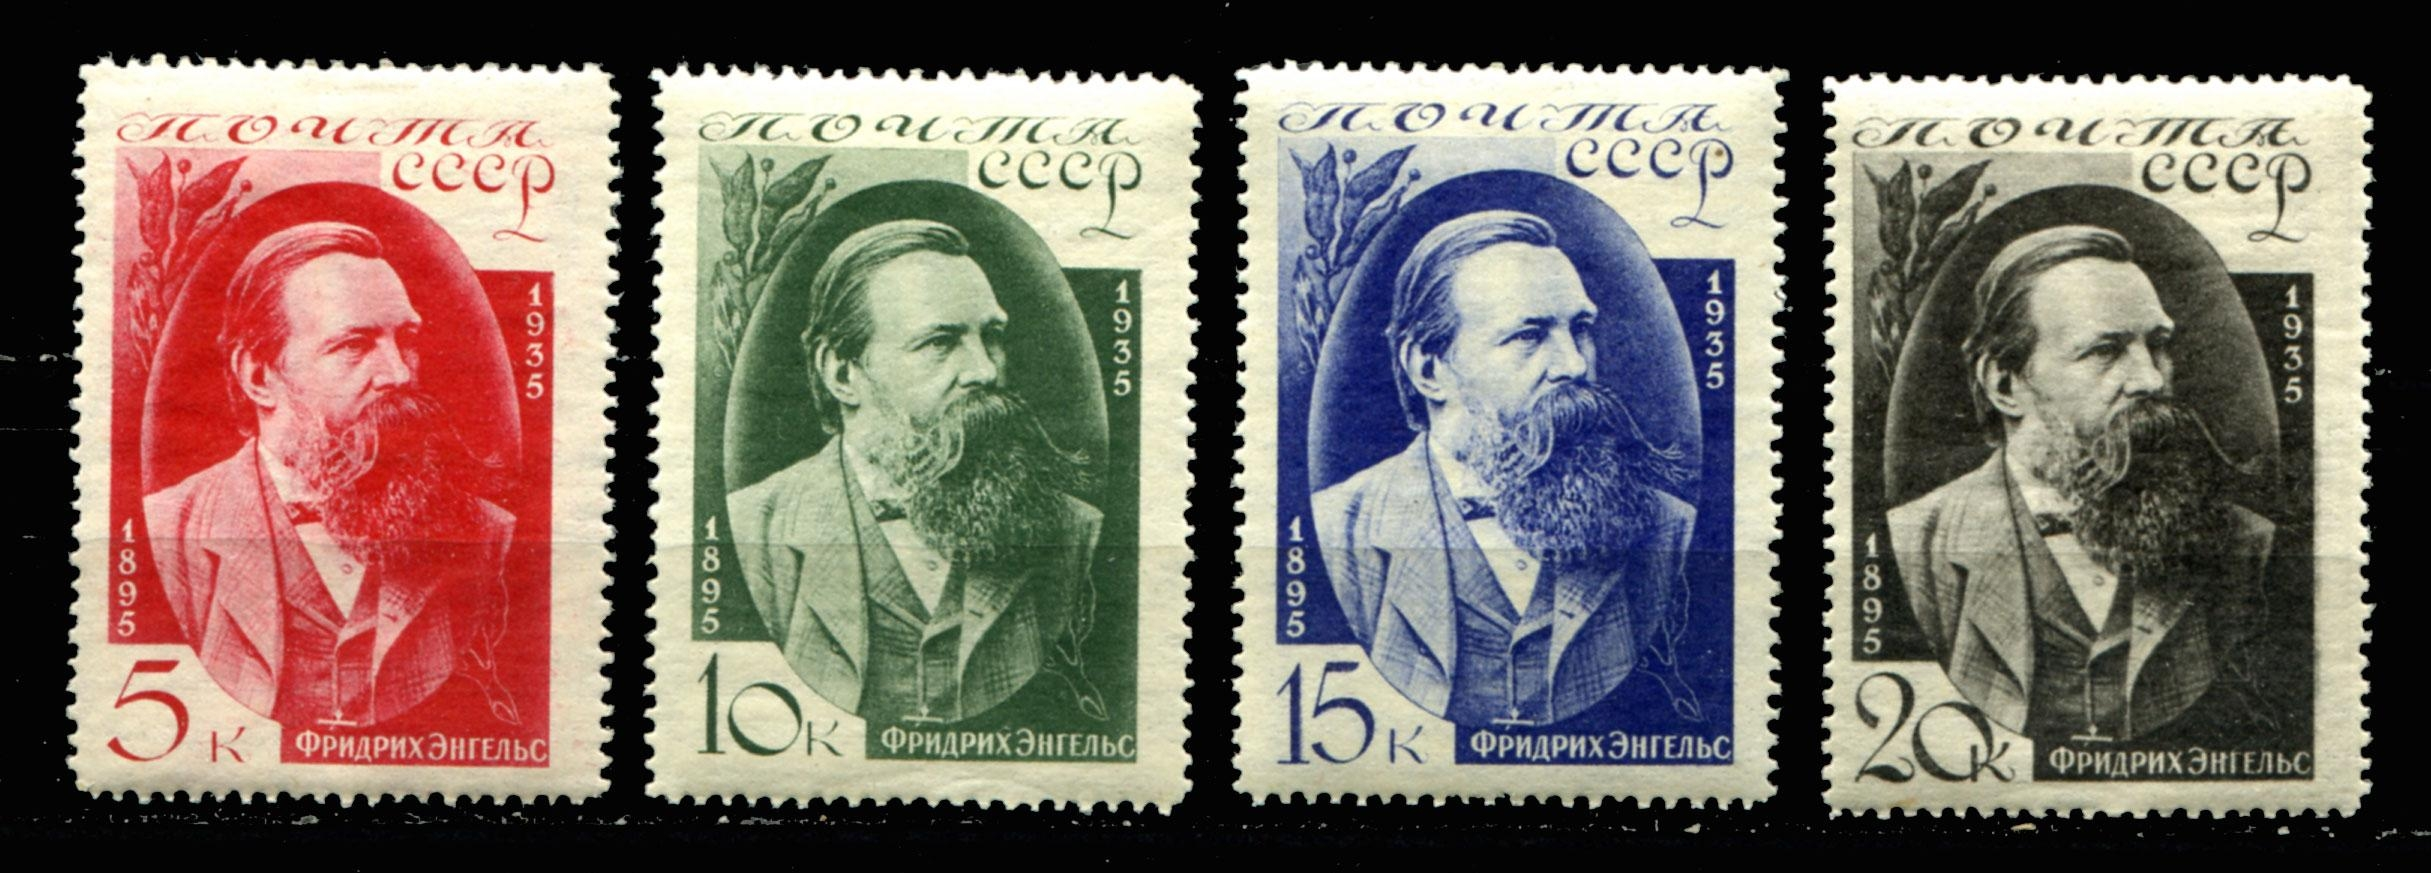 марки на английском аукционе